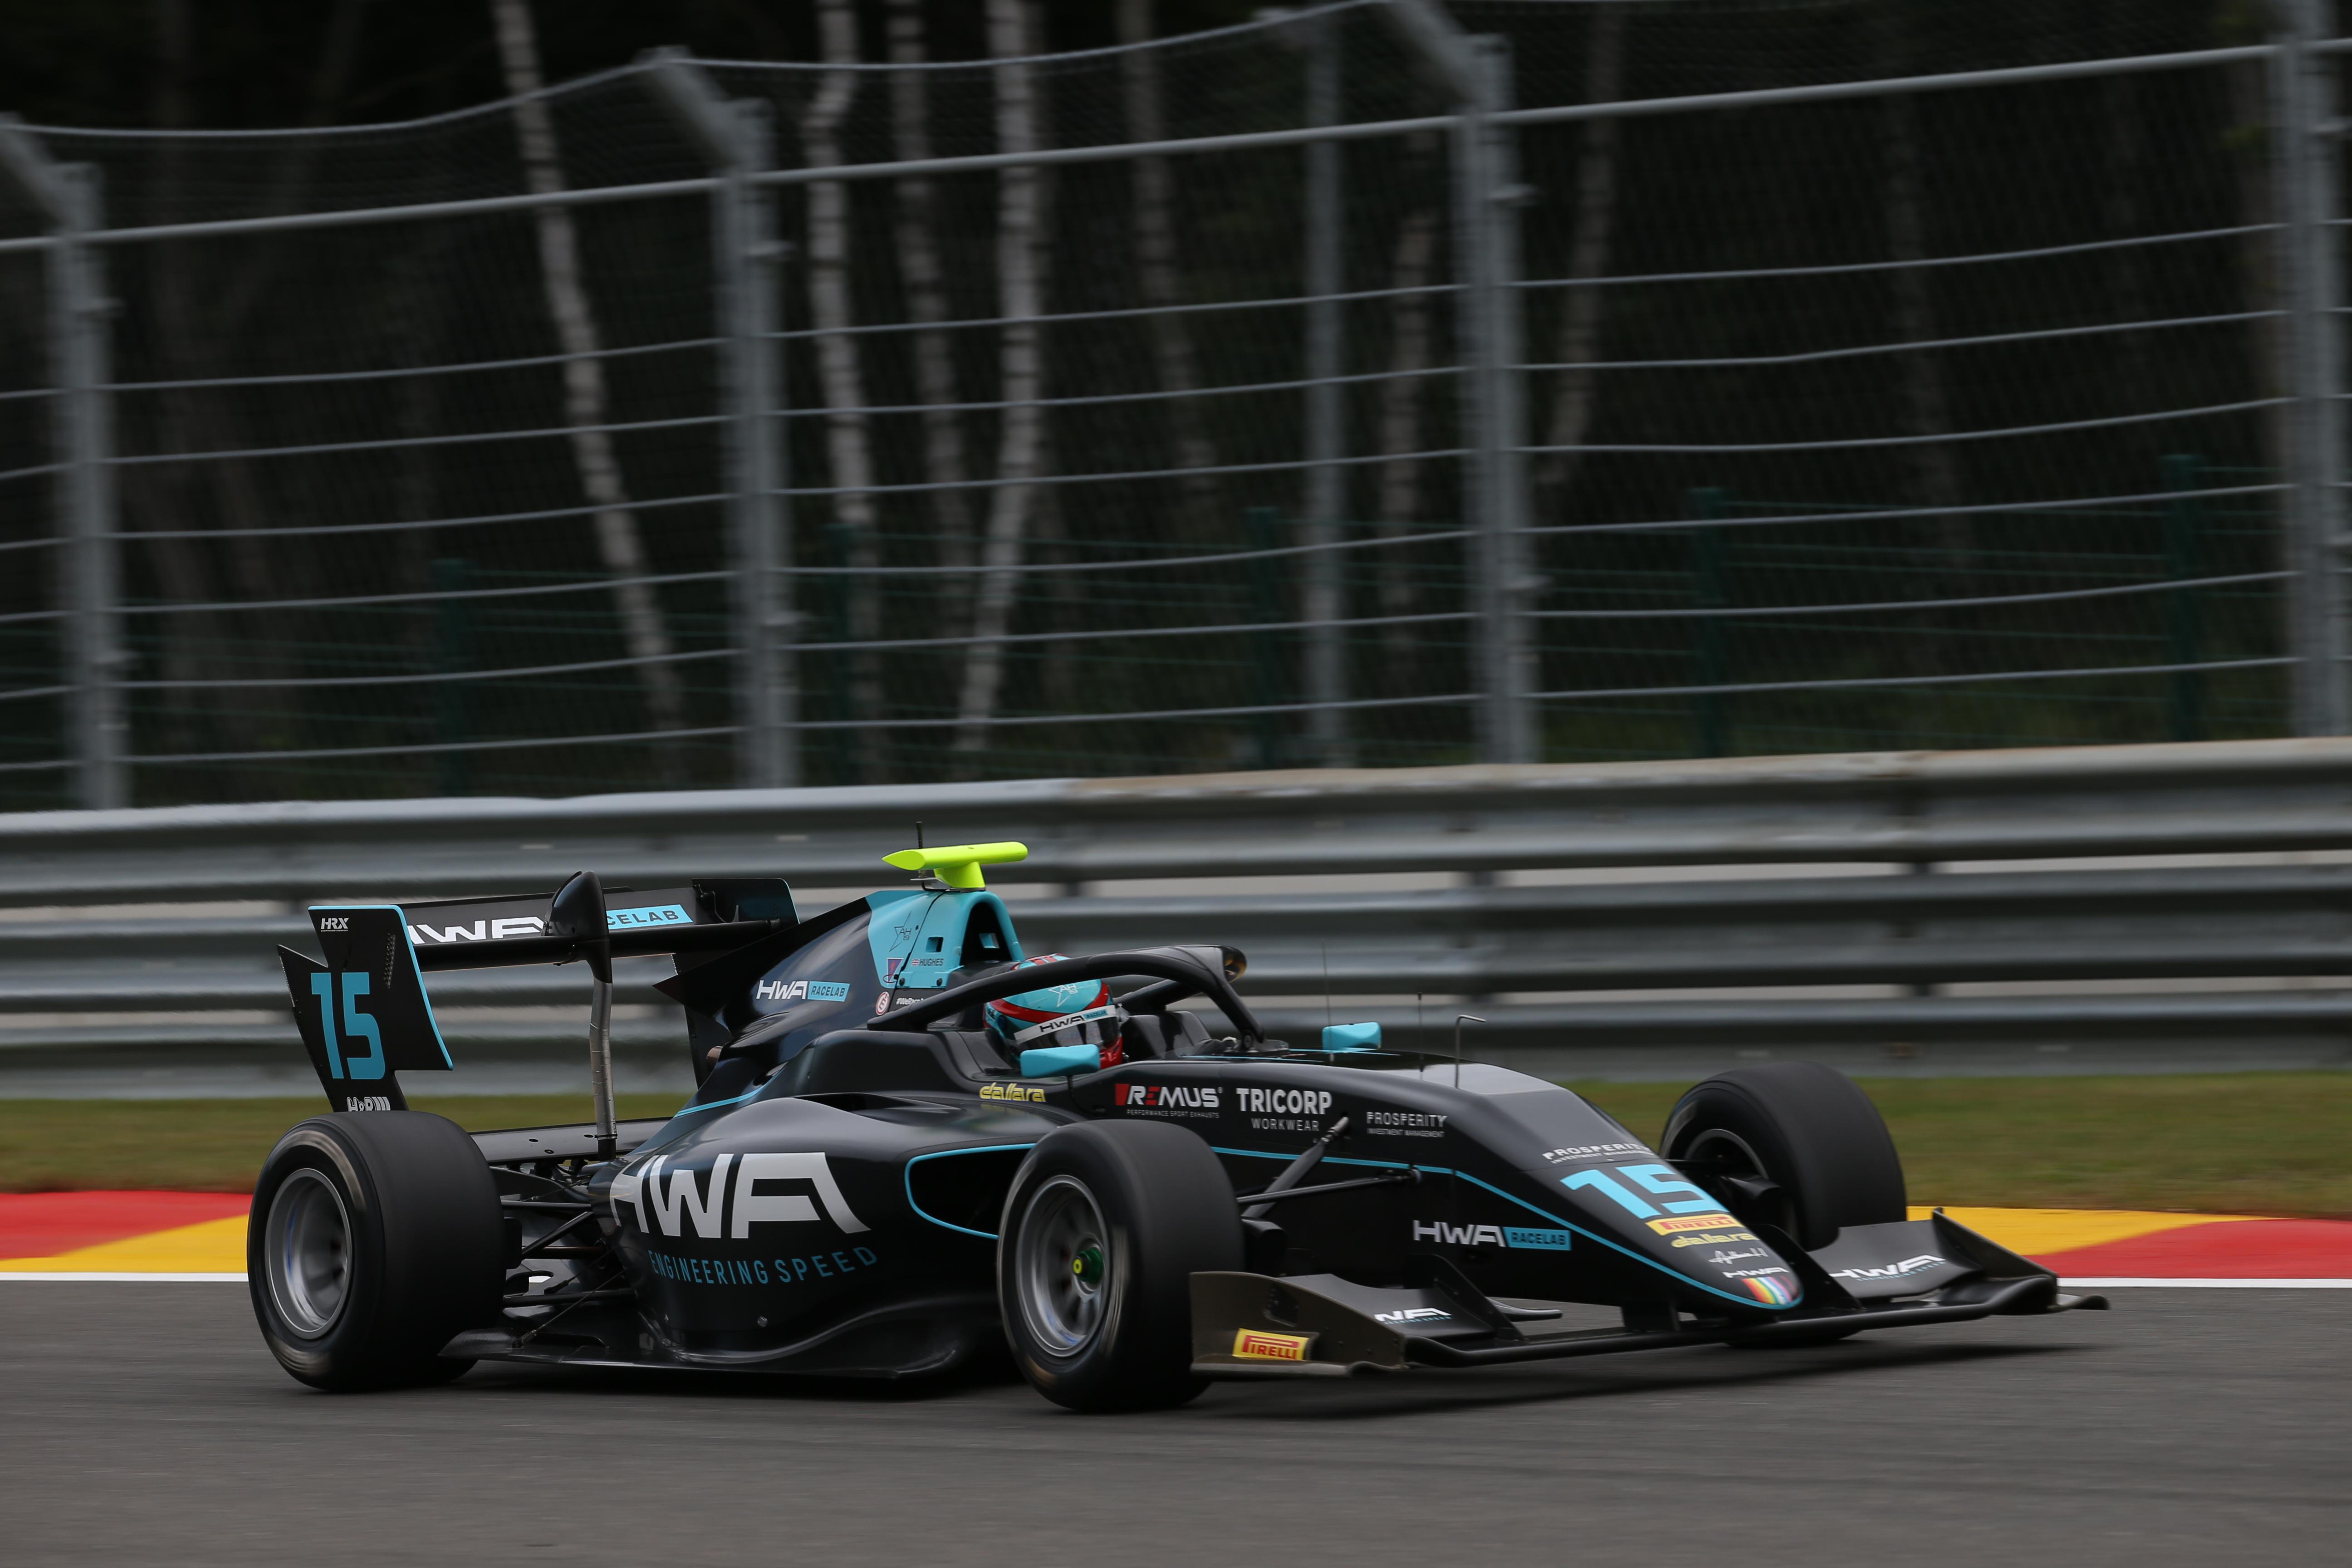 Motor Racing Fia Formula 3 Championship Friday Spa Francorchamps, Belgium